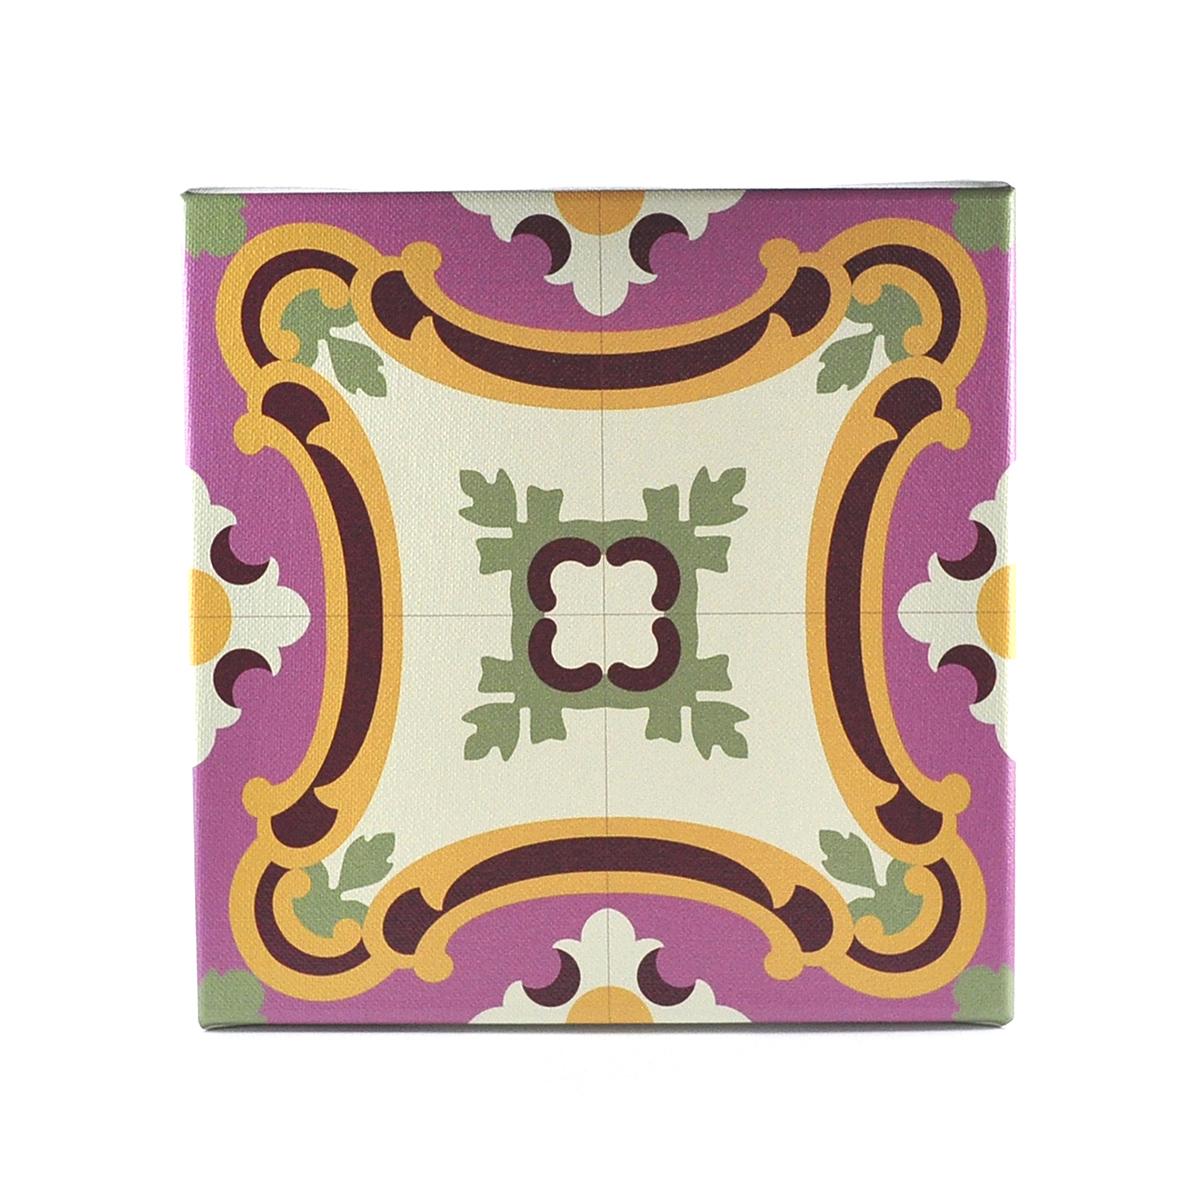 Malta Tile Canvas Block, pattern no.5